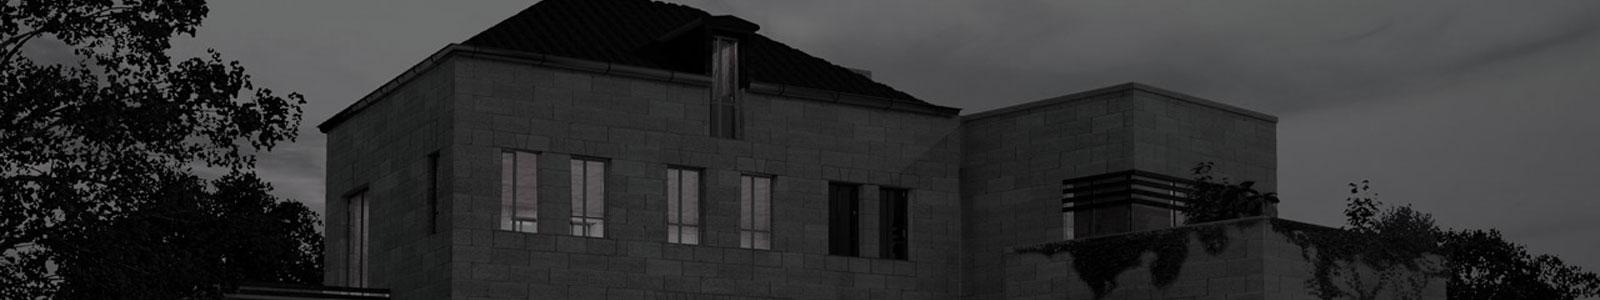 night-_print1